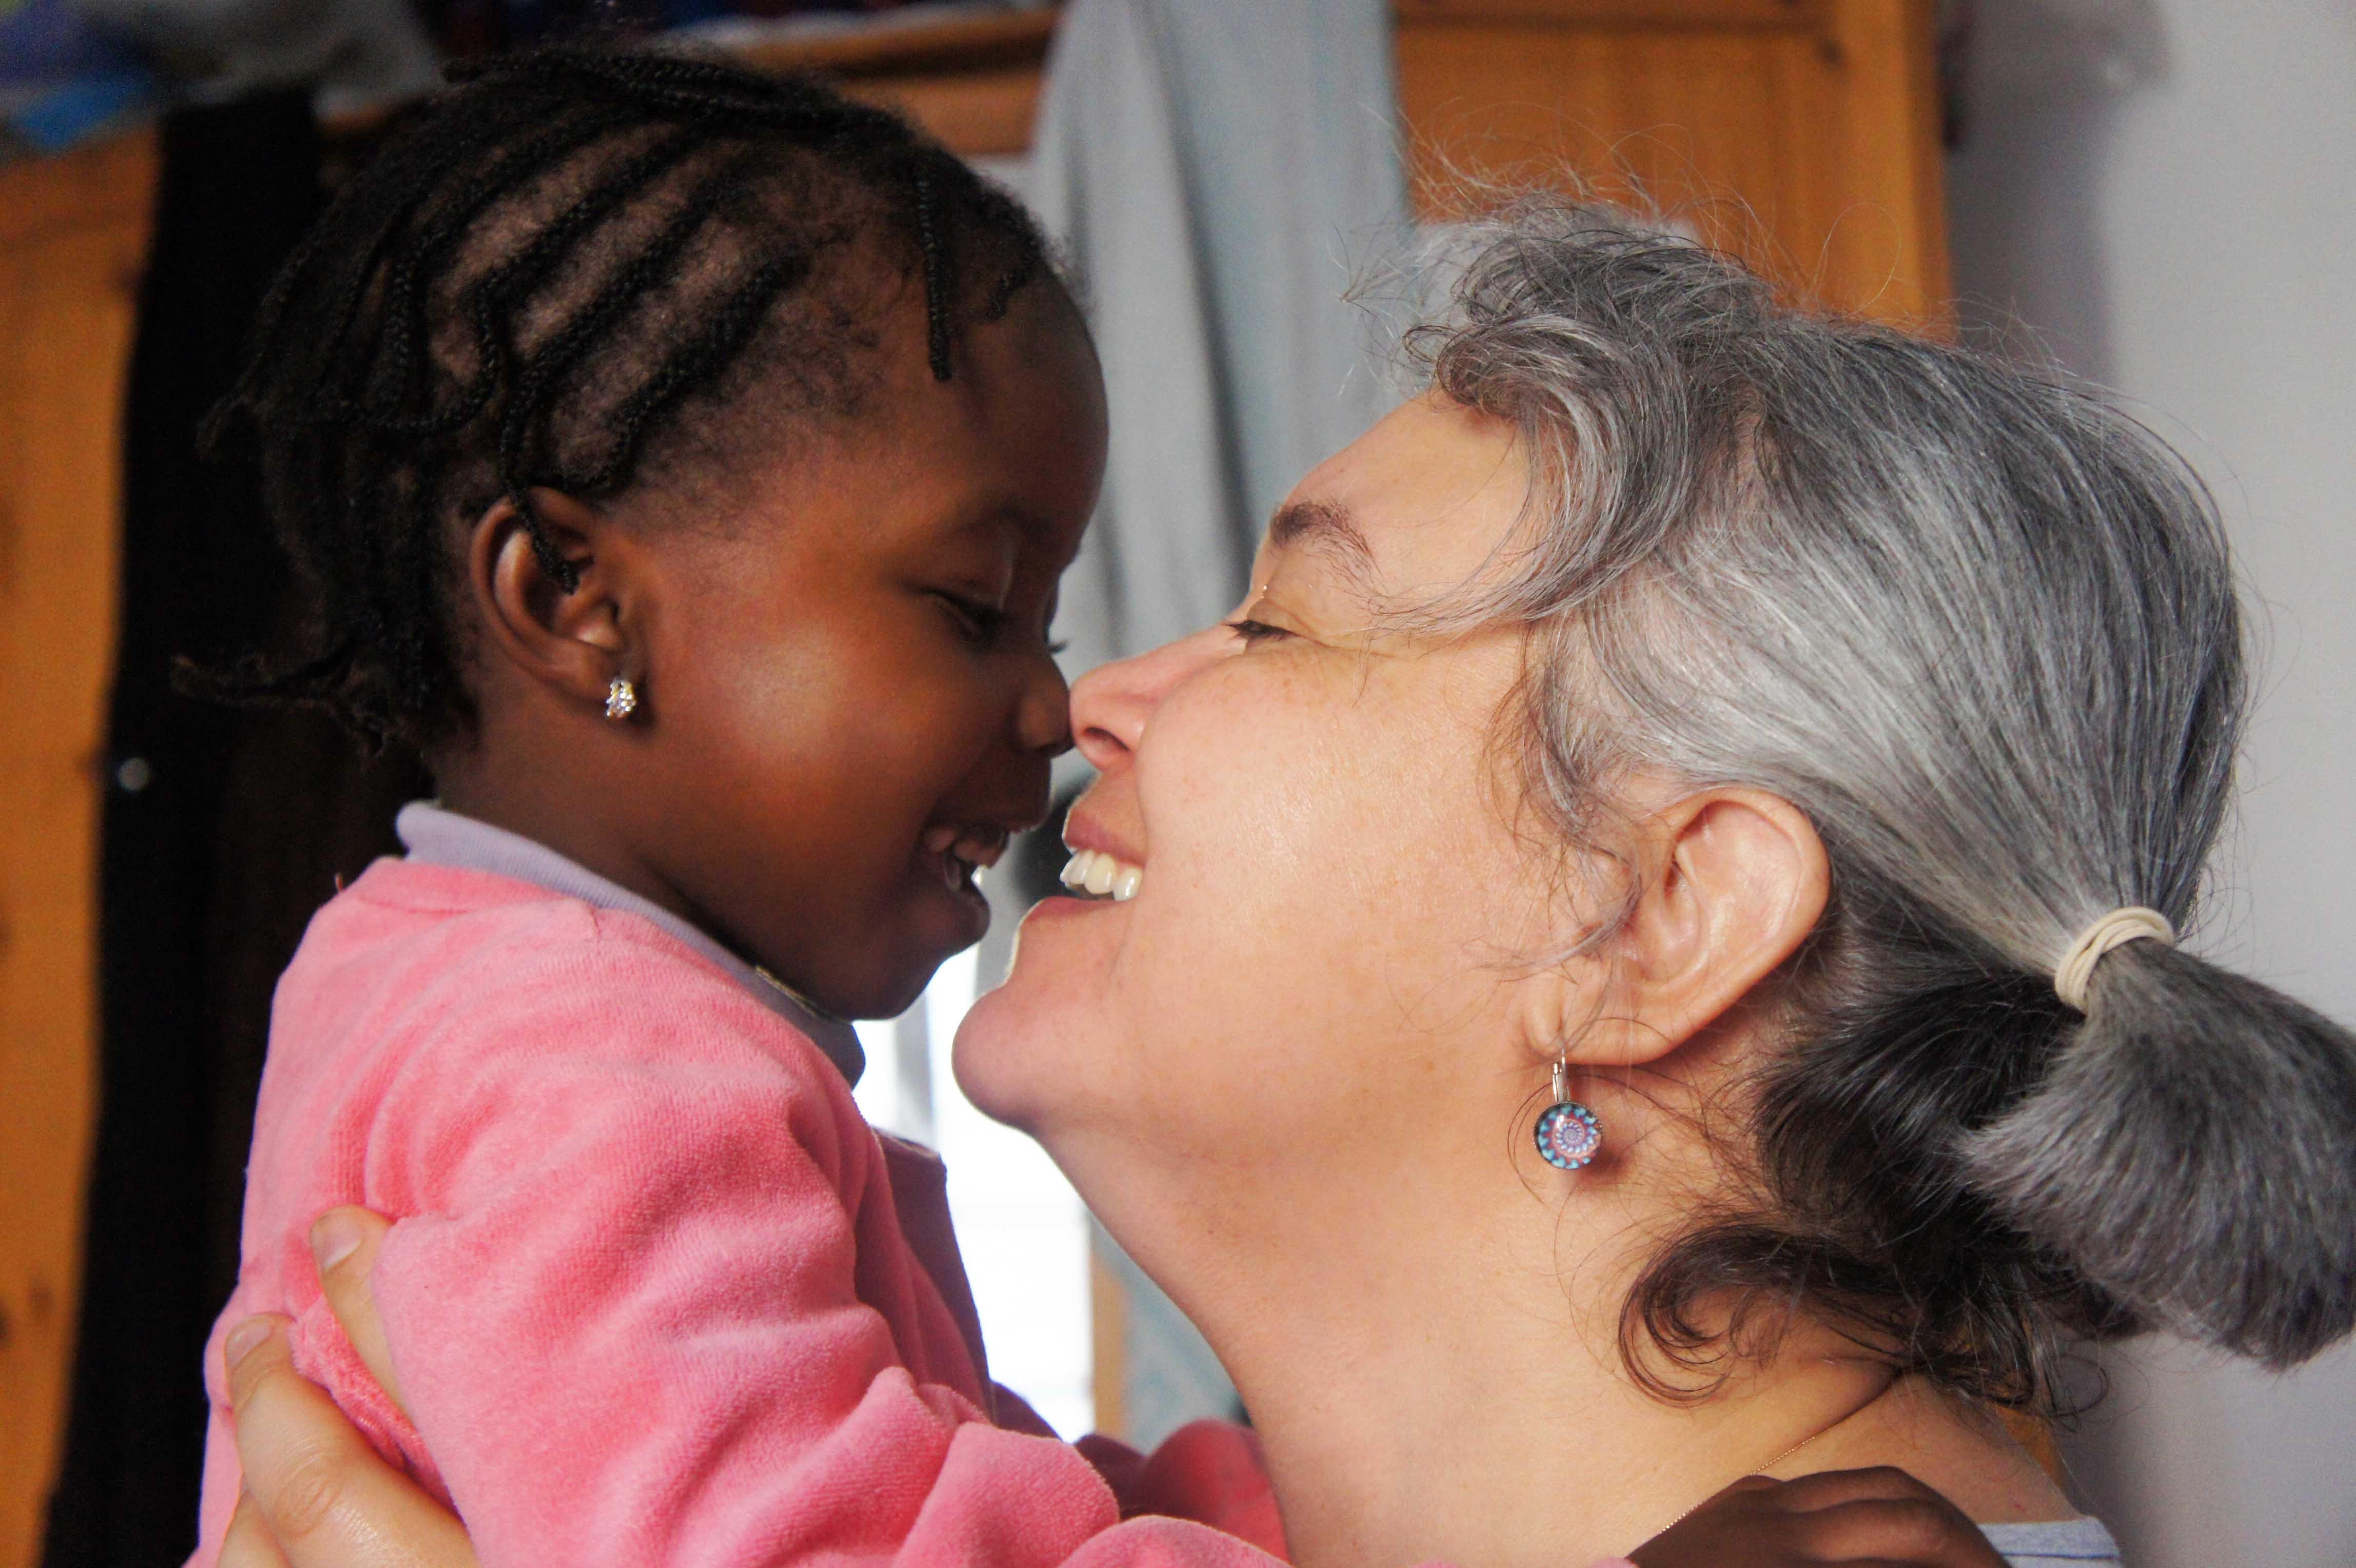 Djeneba et sa maman d'accueil